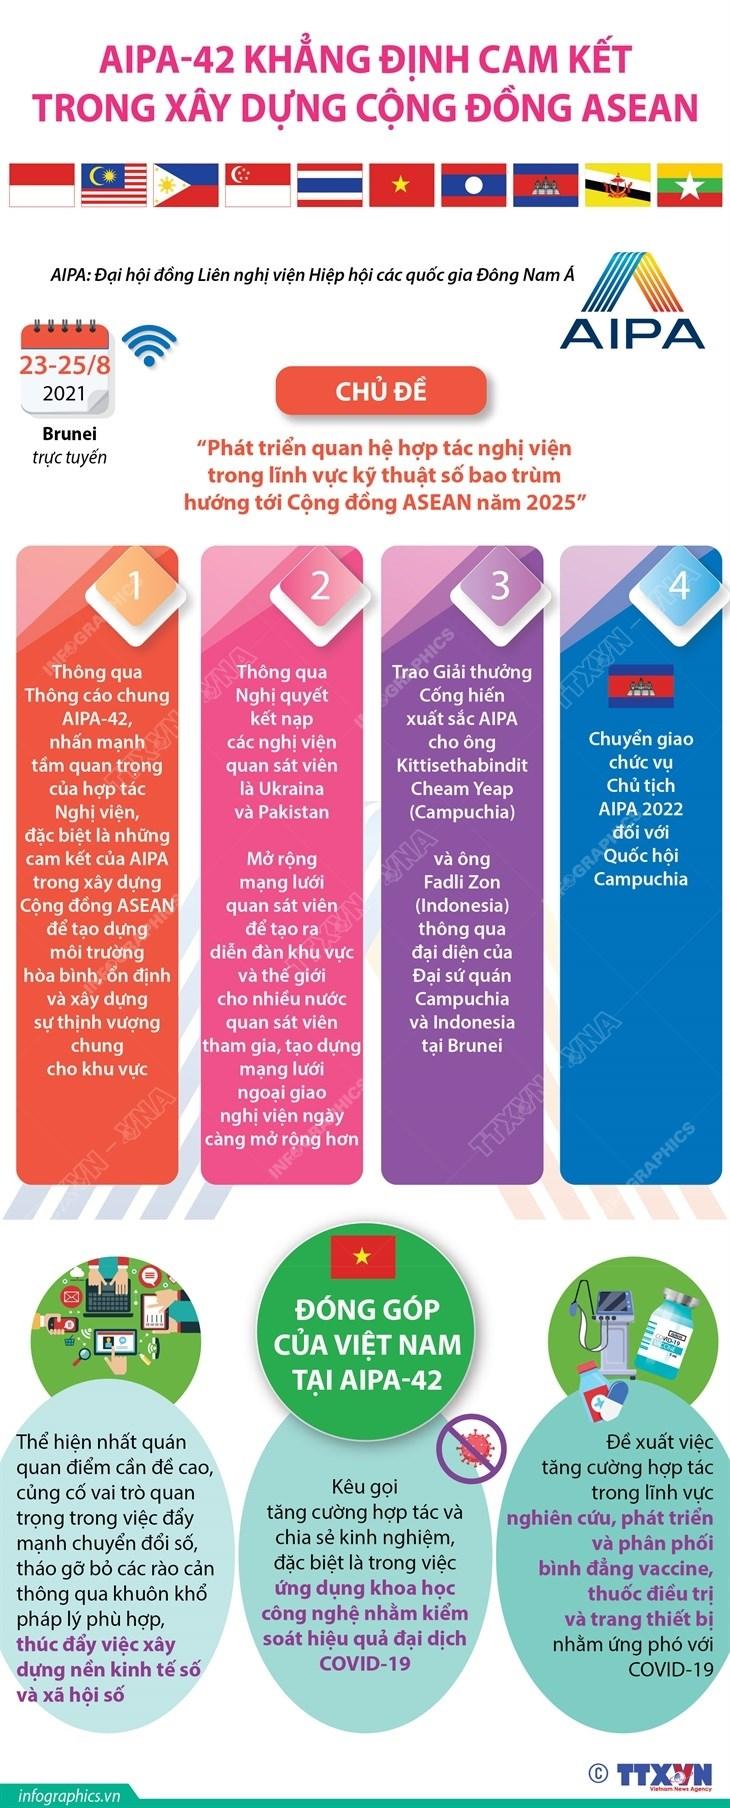 [Infographics] AIPA-42 khang dinh cam ket ve xay dung Cong dong ASEAN hinh anh 1